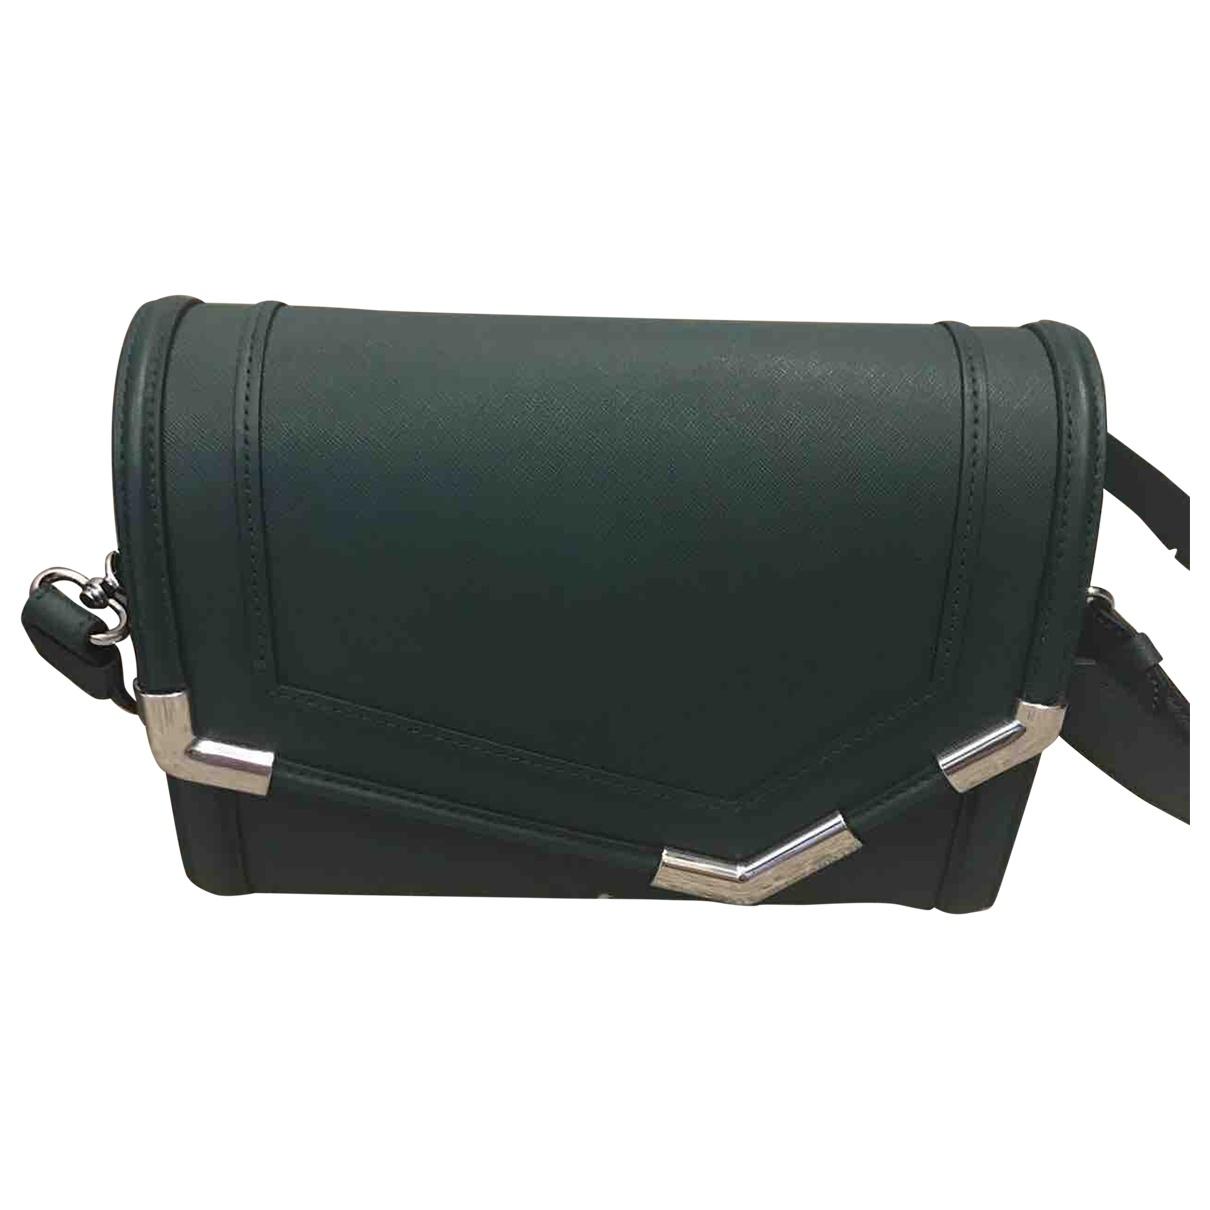 Karl Lagerfeld \N Green Leather handbag for Women \N